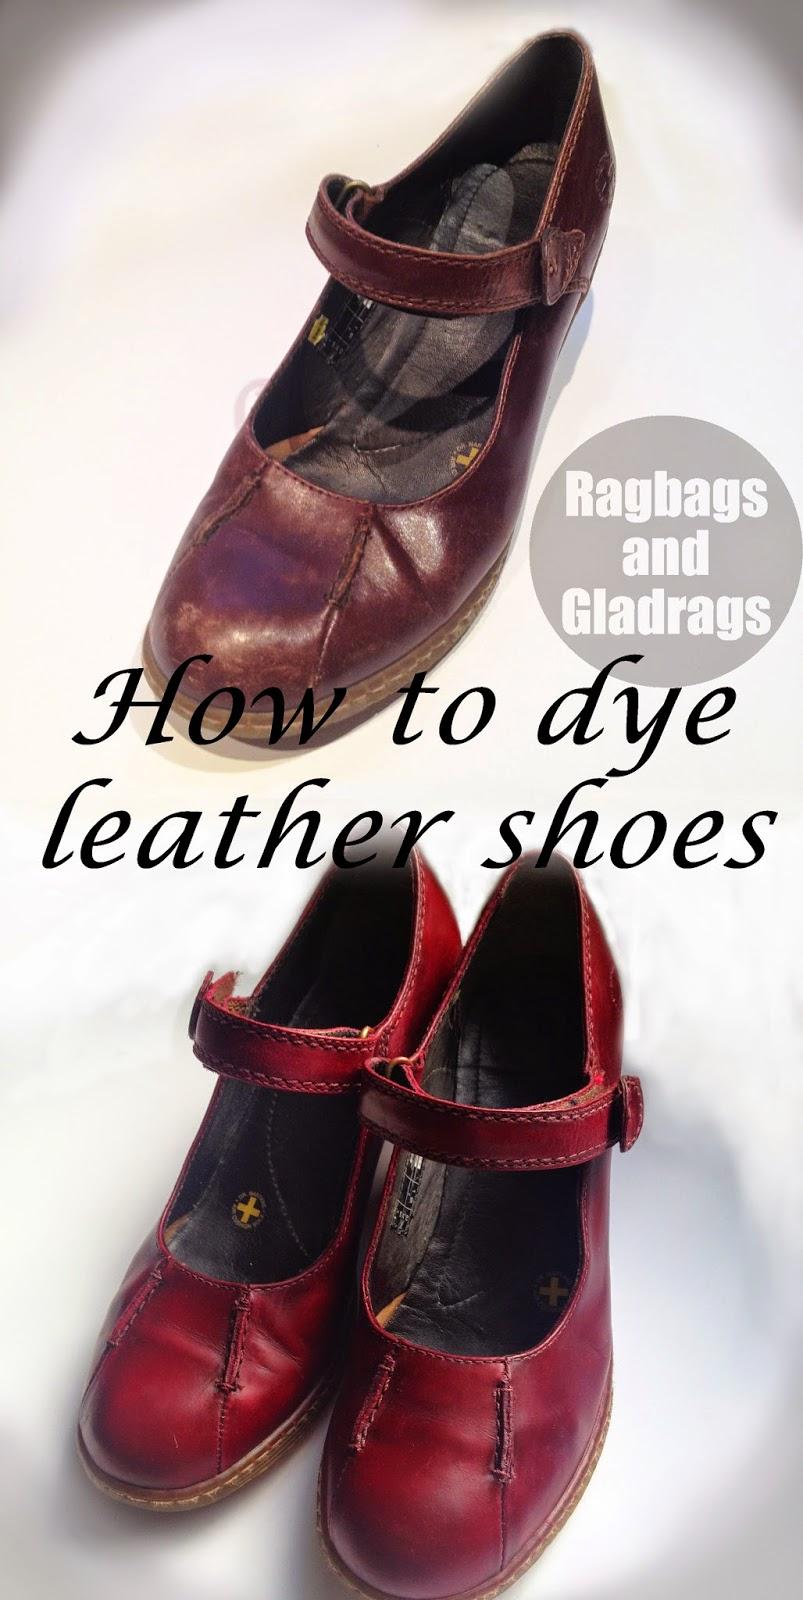 Where Can I Buy Shoe Dye In Uk